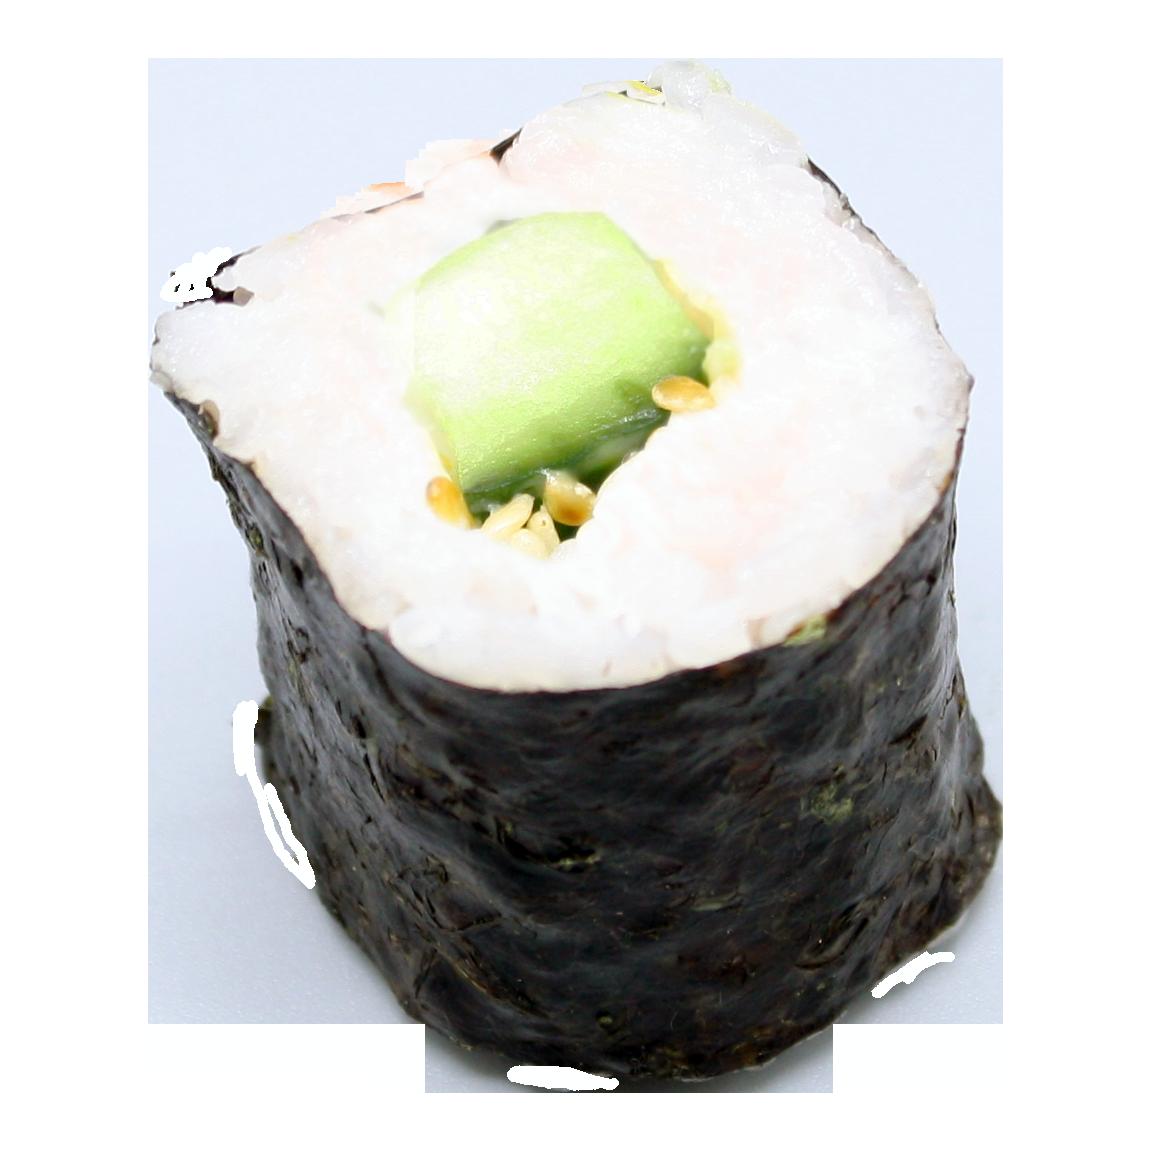 Kappa /黄瓜寿司(8个)